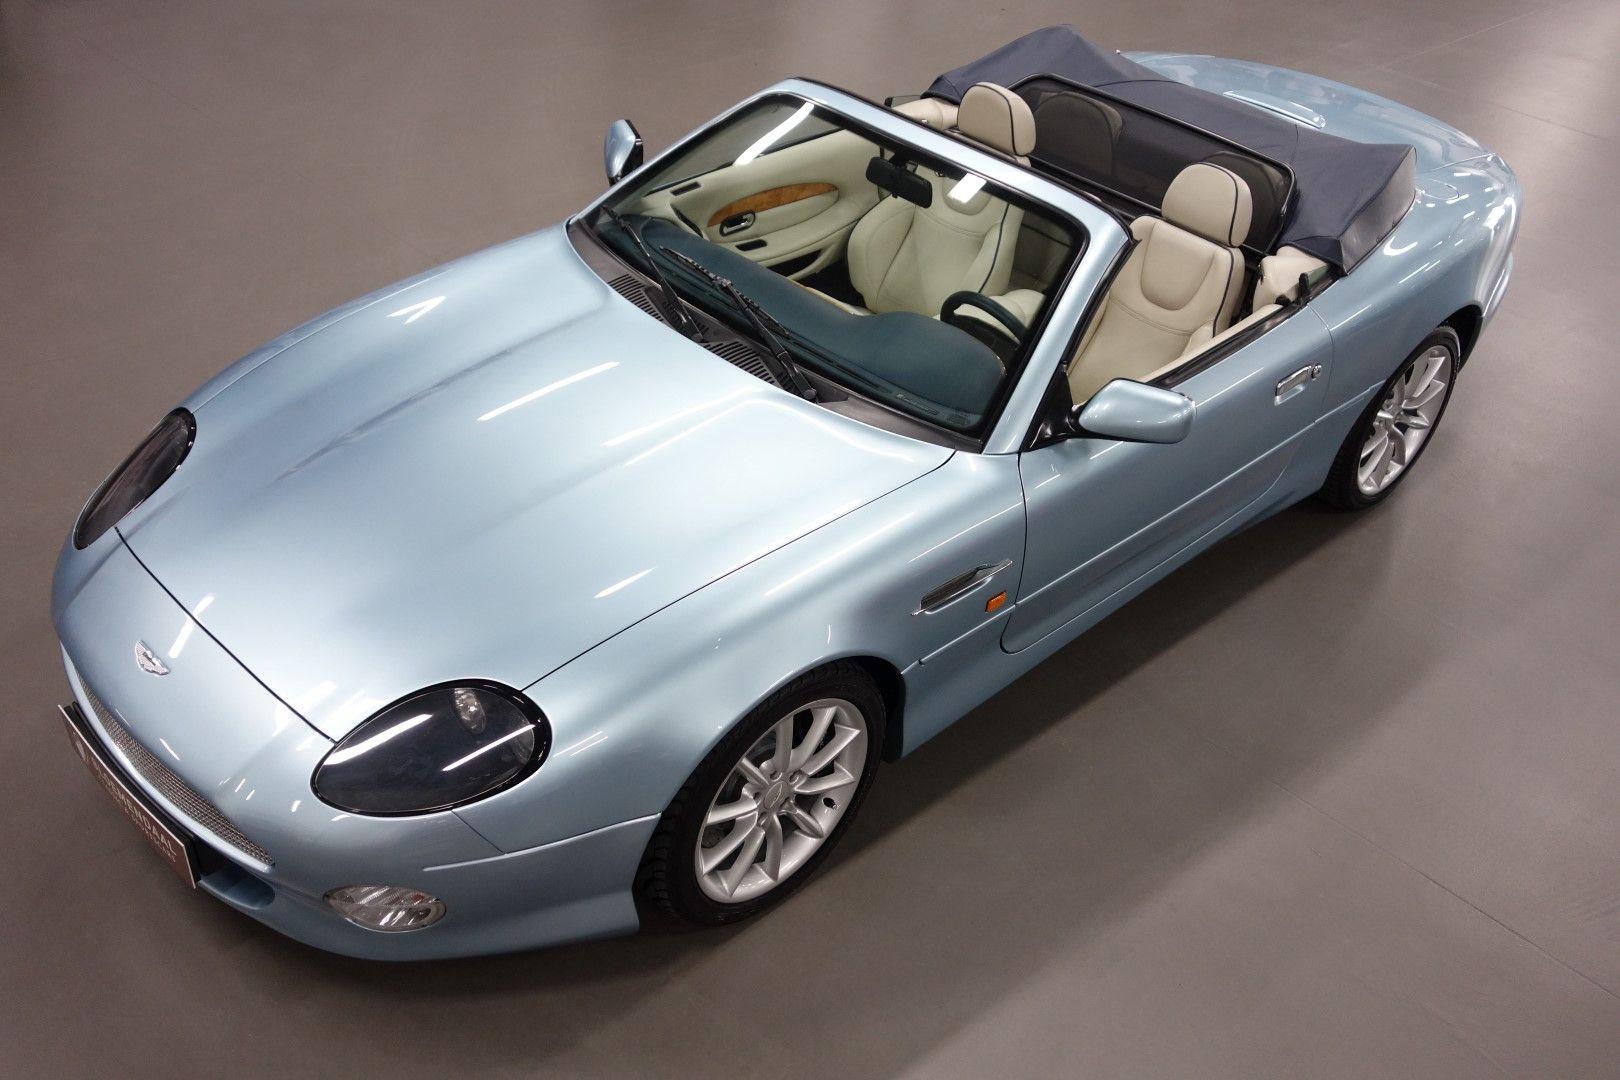 aston martin db7 vantage volante | cool old euro cars | pinterest